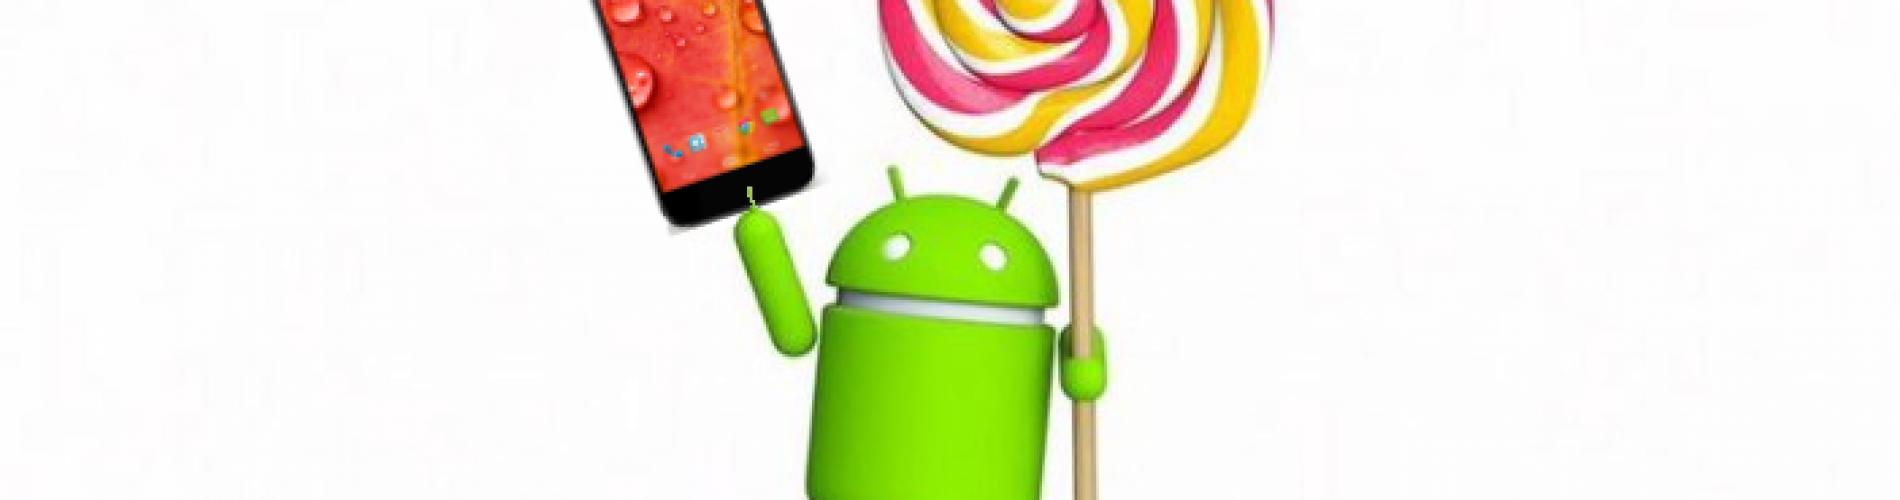 Moto G (1st Gen) will start receiving Android 5.0.2 Lollipop